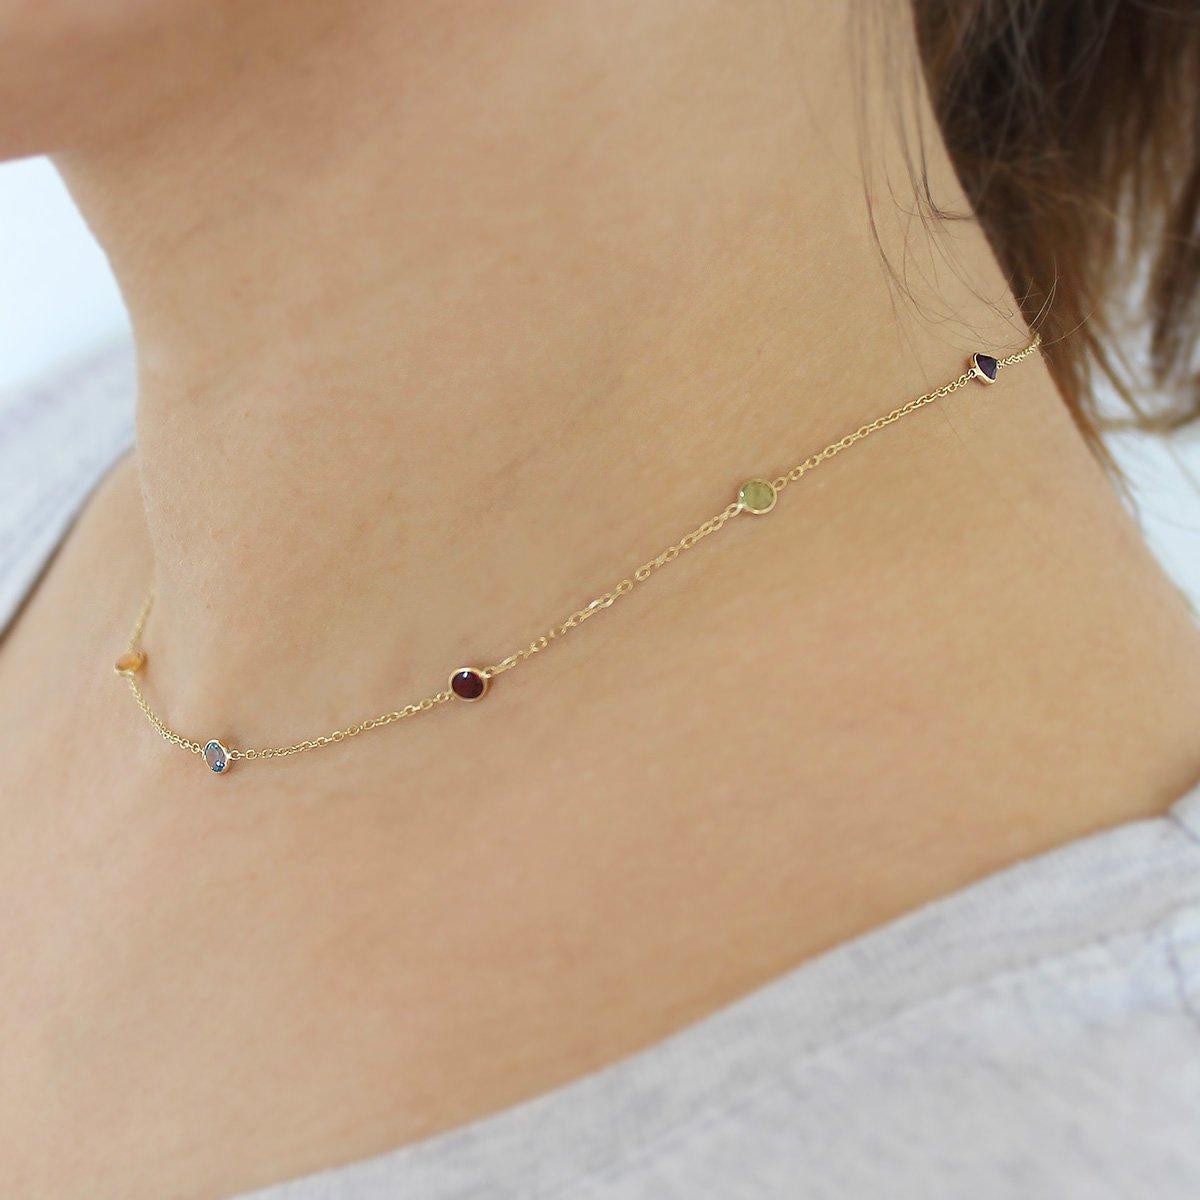 14k Yellow Gold Bezel Set Natural Gemstones Station Necklace, 16'' by Beauniq (Image #3)